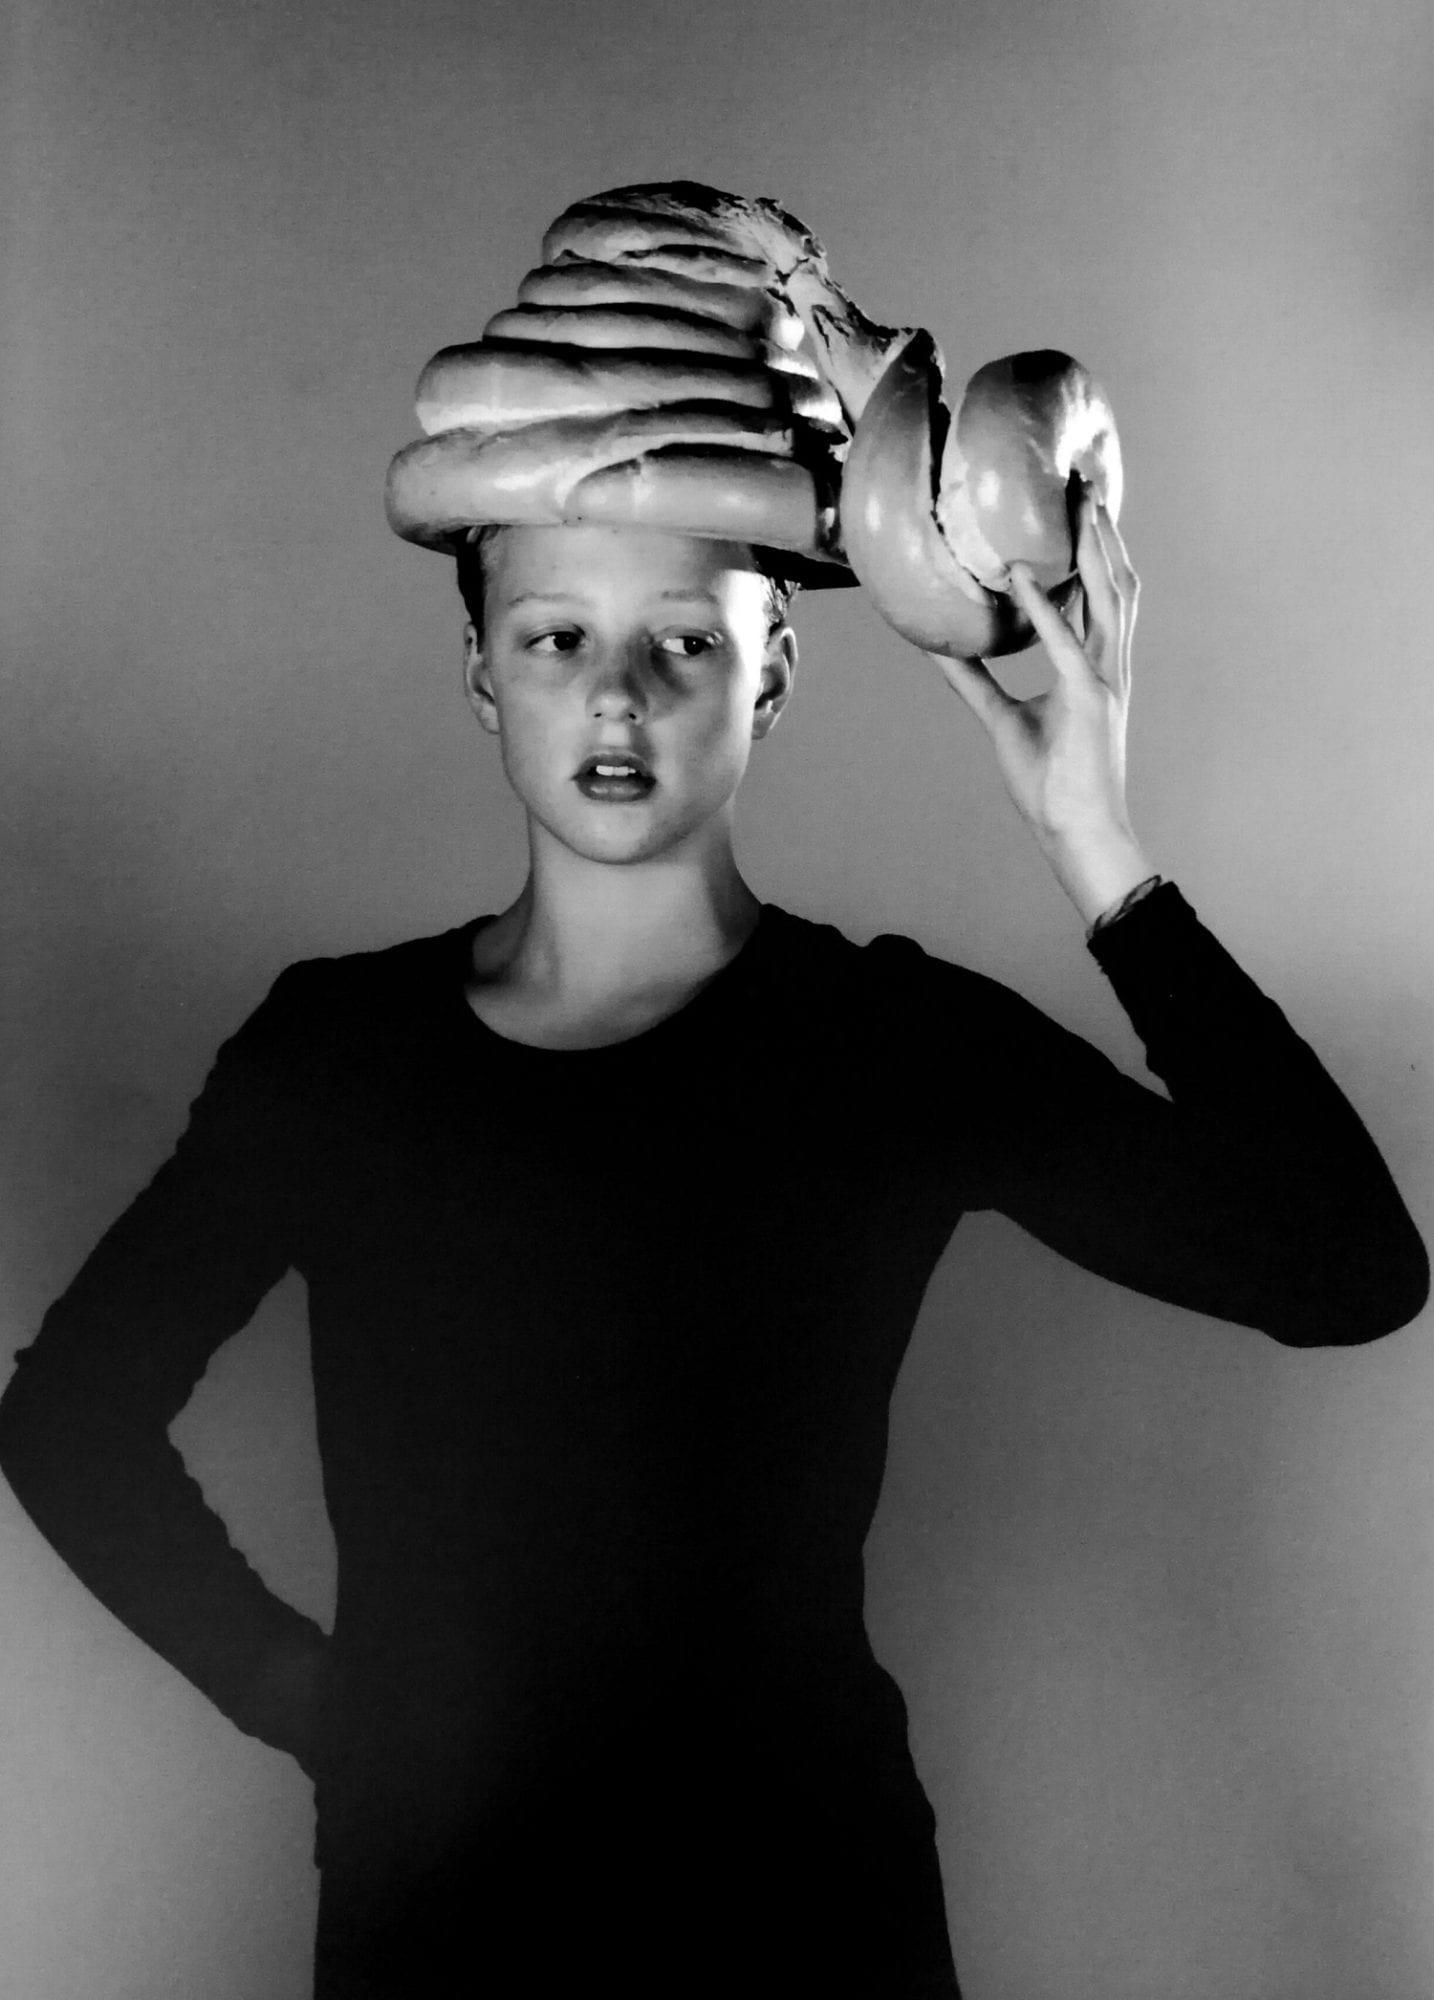 Eva Lootz, Pequeño teatro de derivas. Her skill to learn, 1994